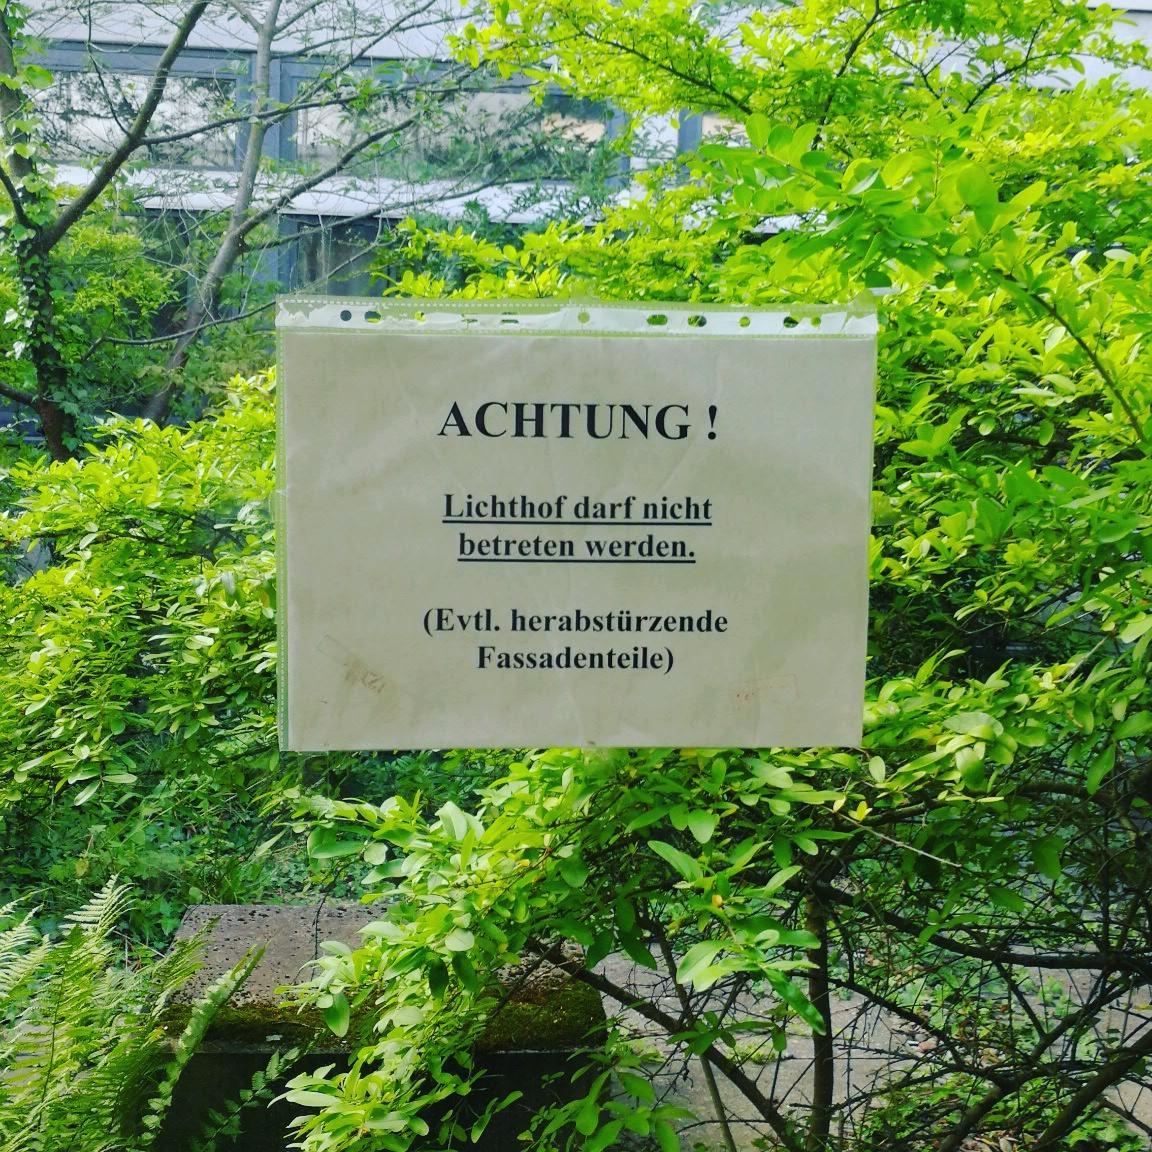 Warnung vor Fassadenteilen